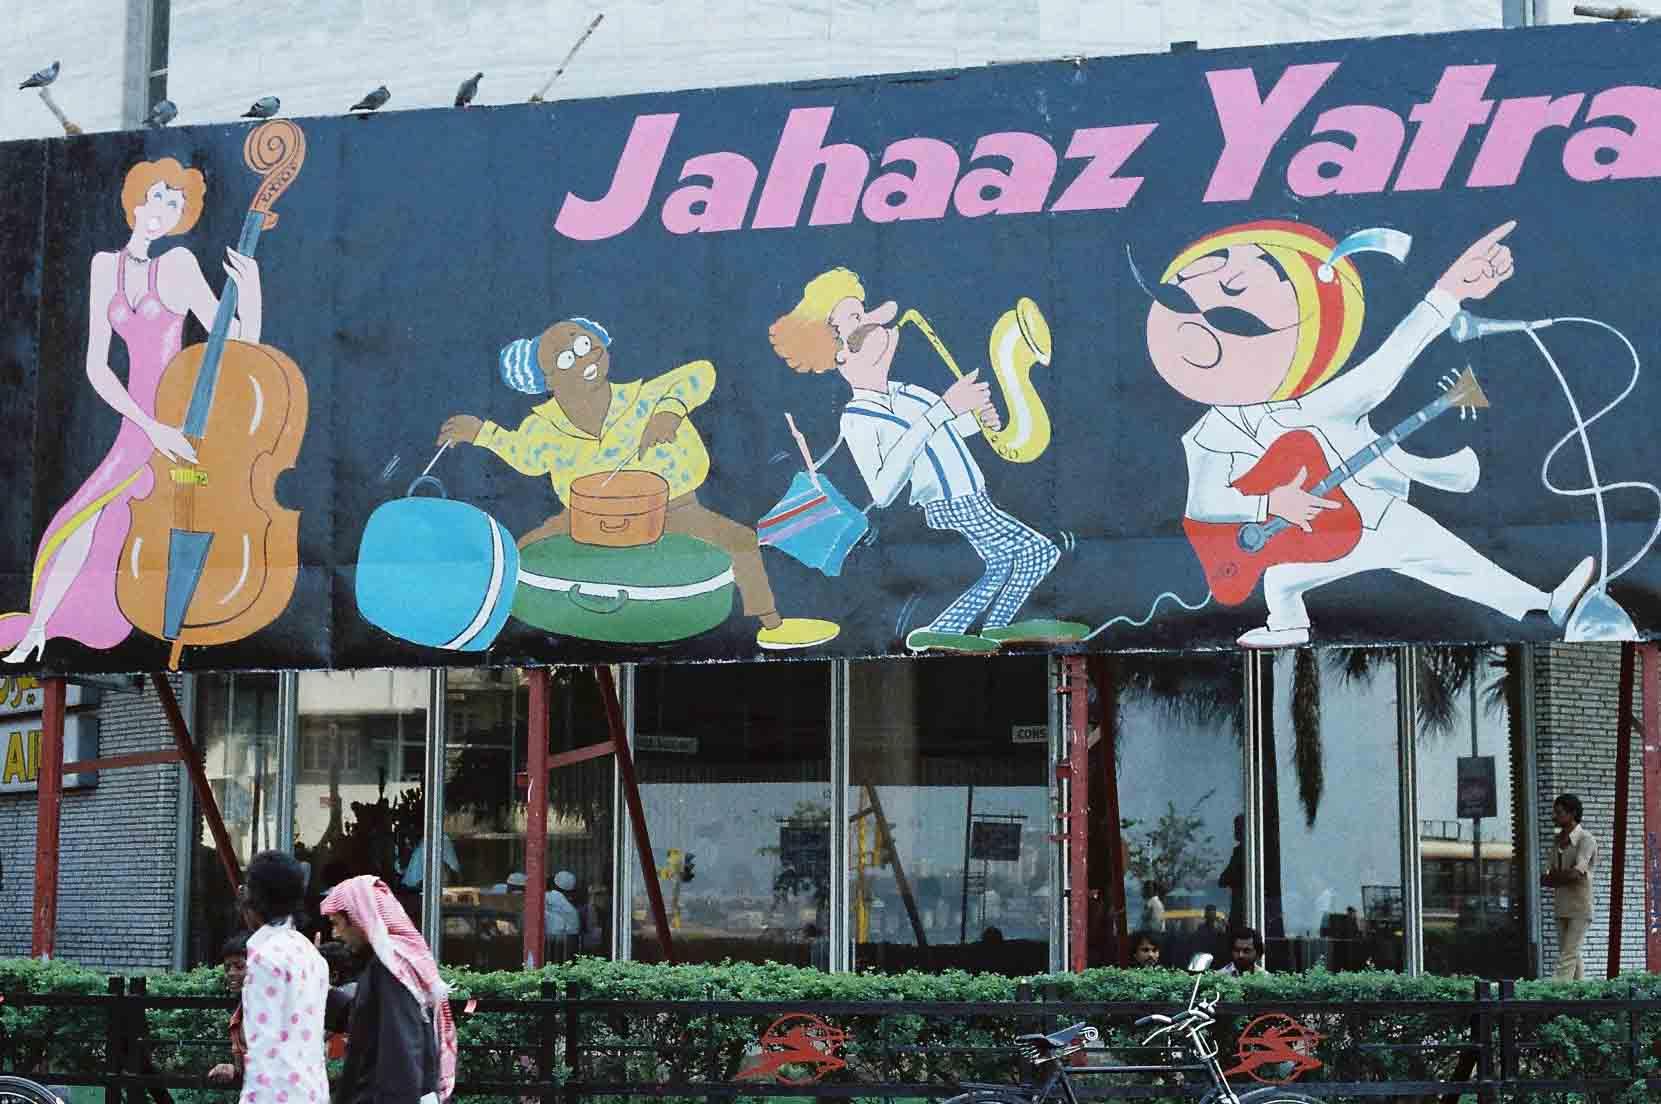 Jazz Yatra